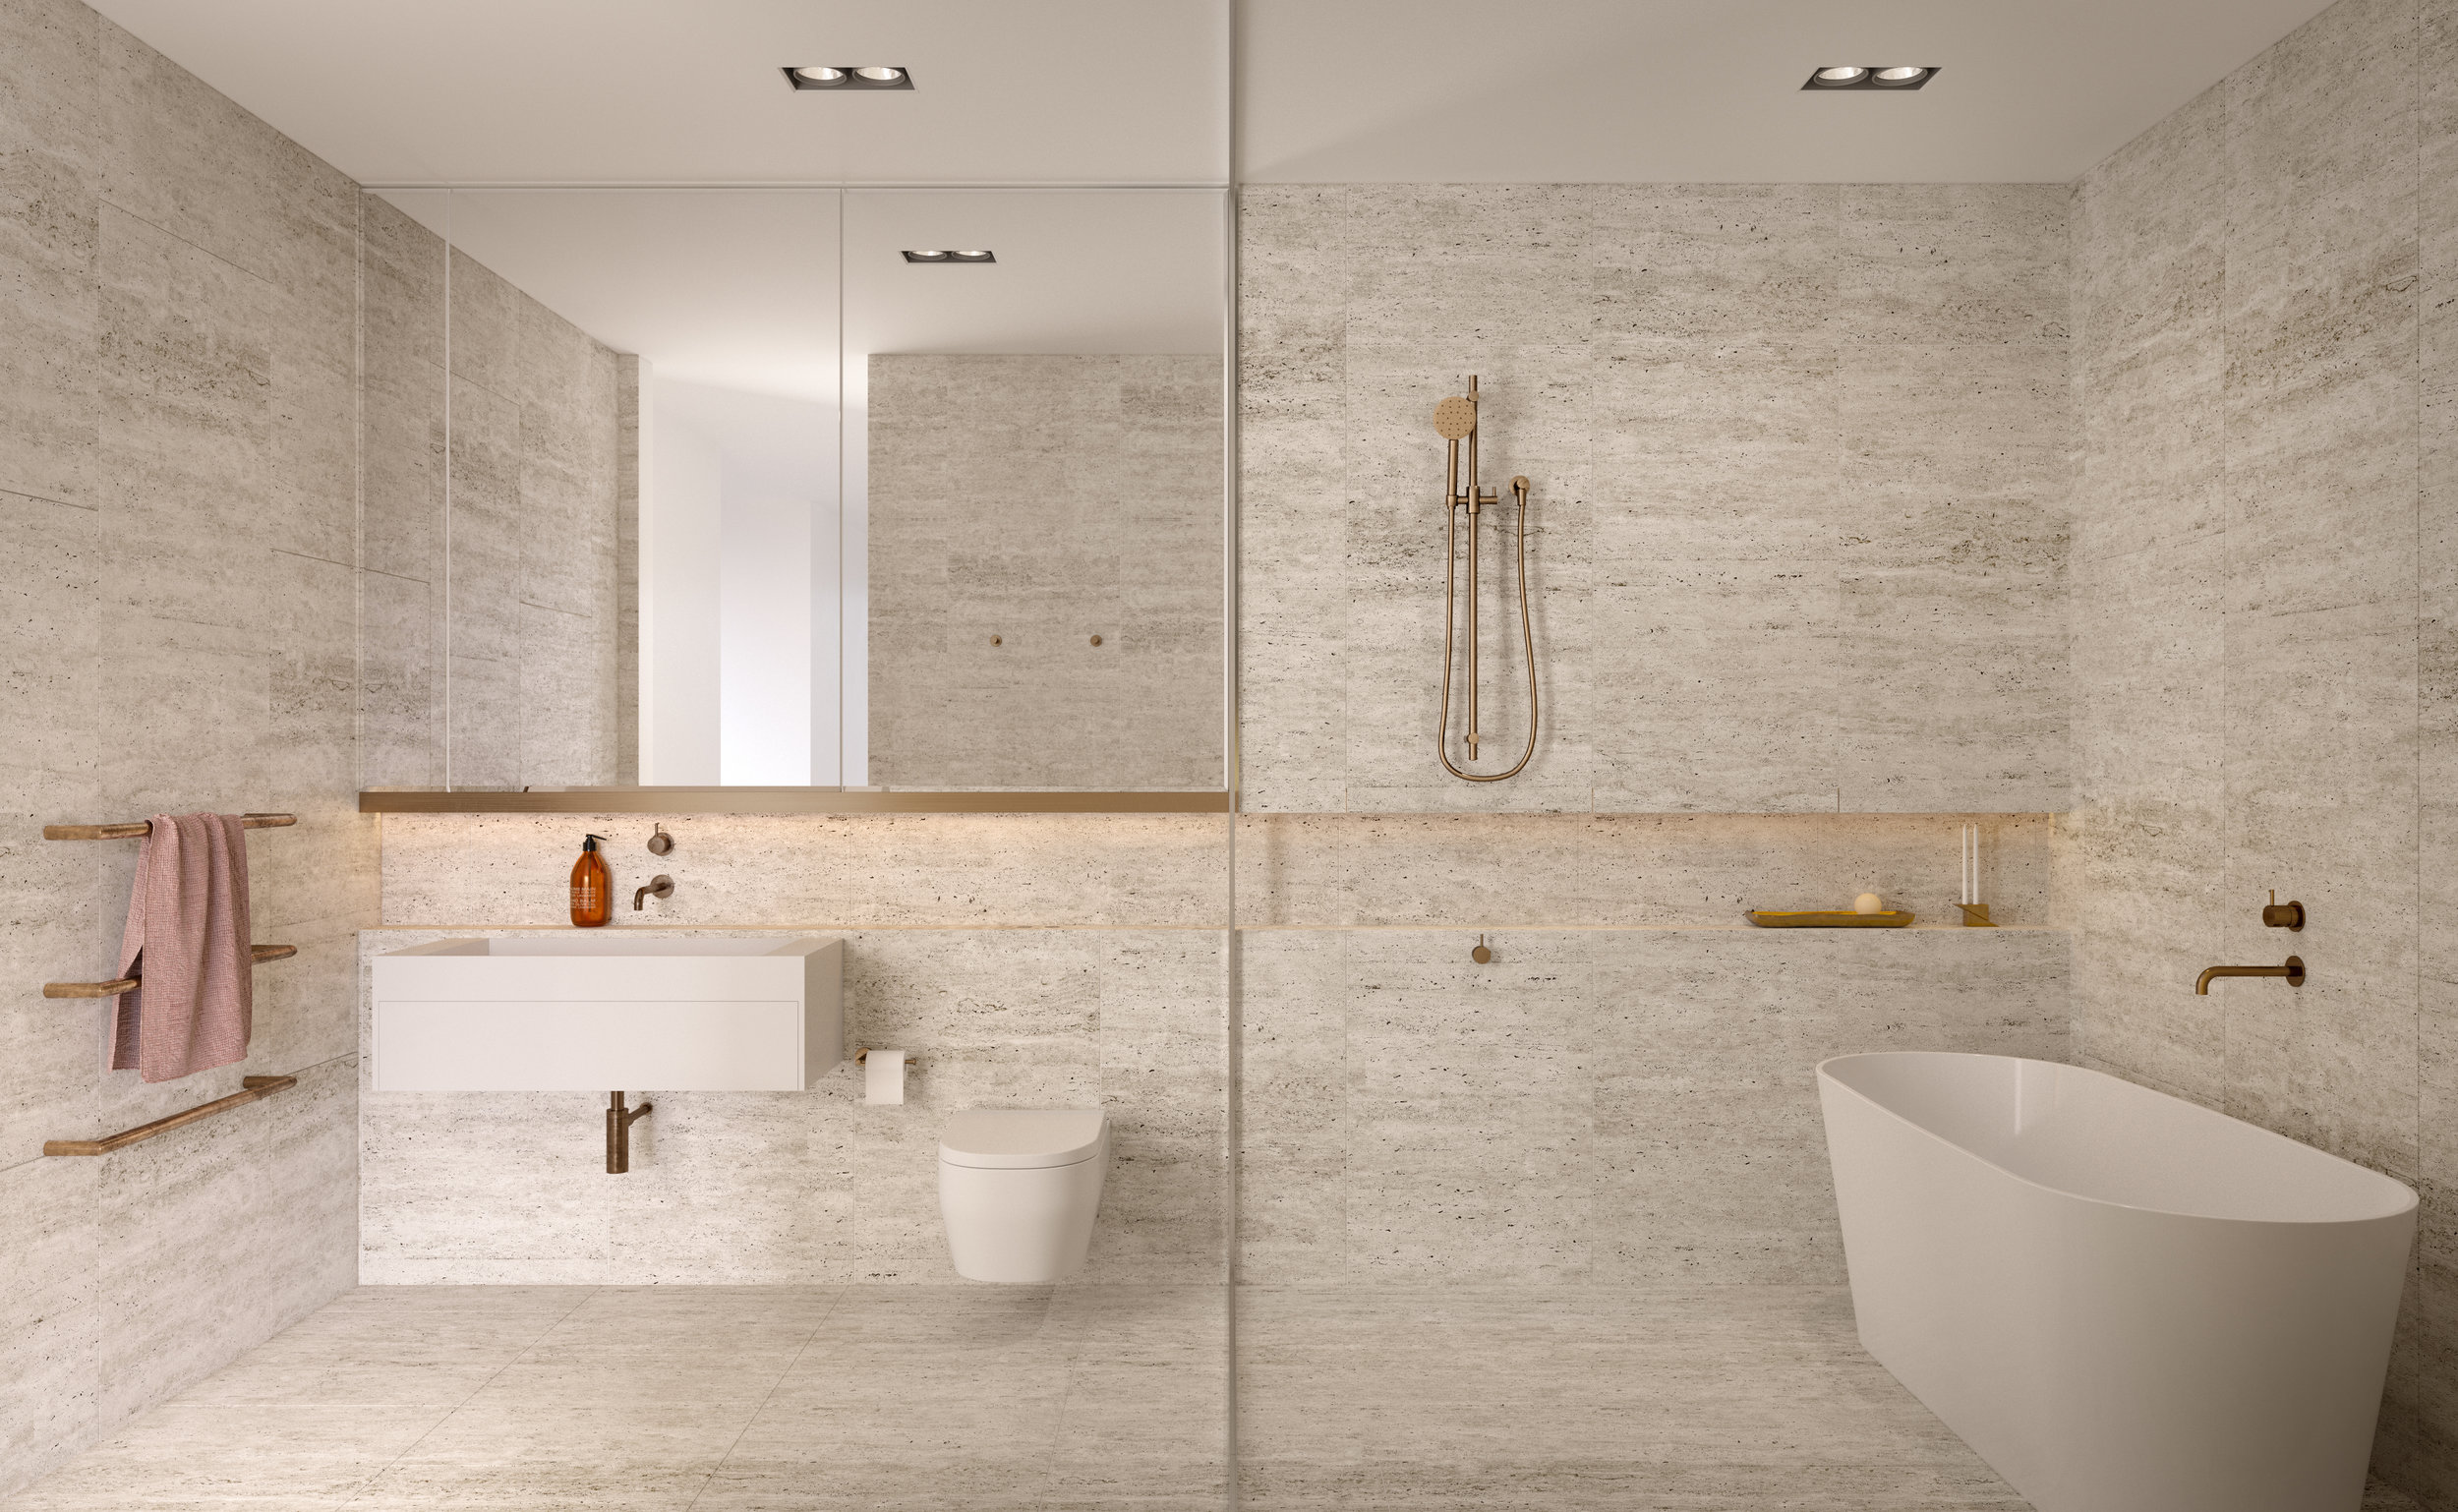 GabrielSaunders_Soto_Auckland_Bathroom.jpg